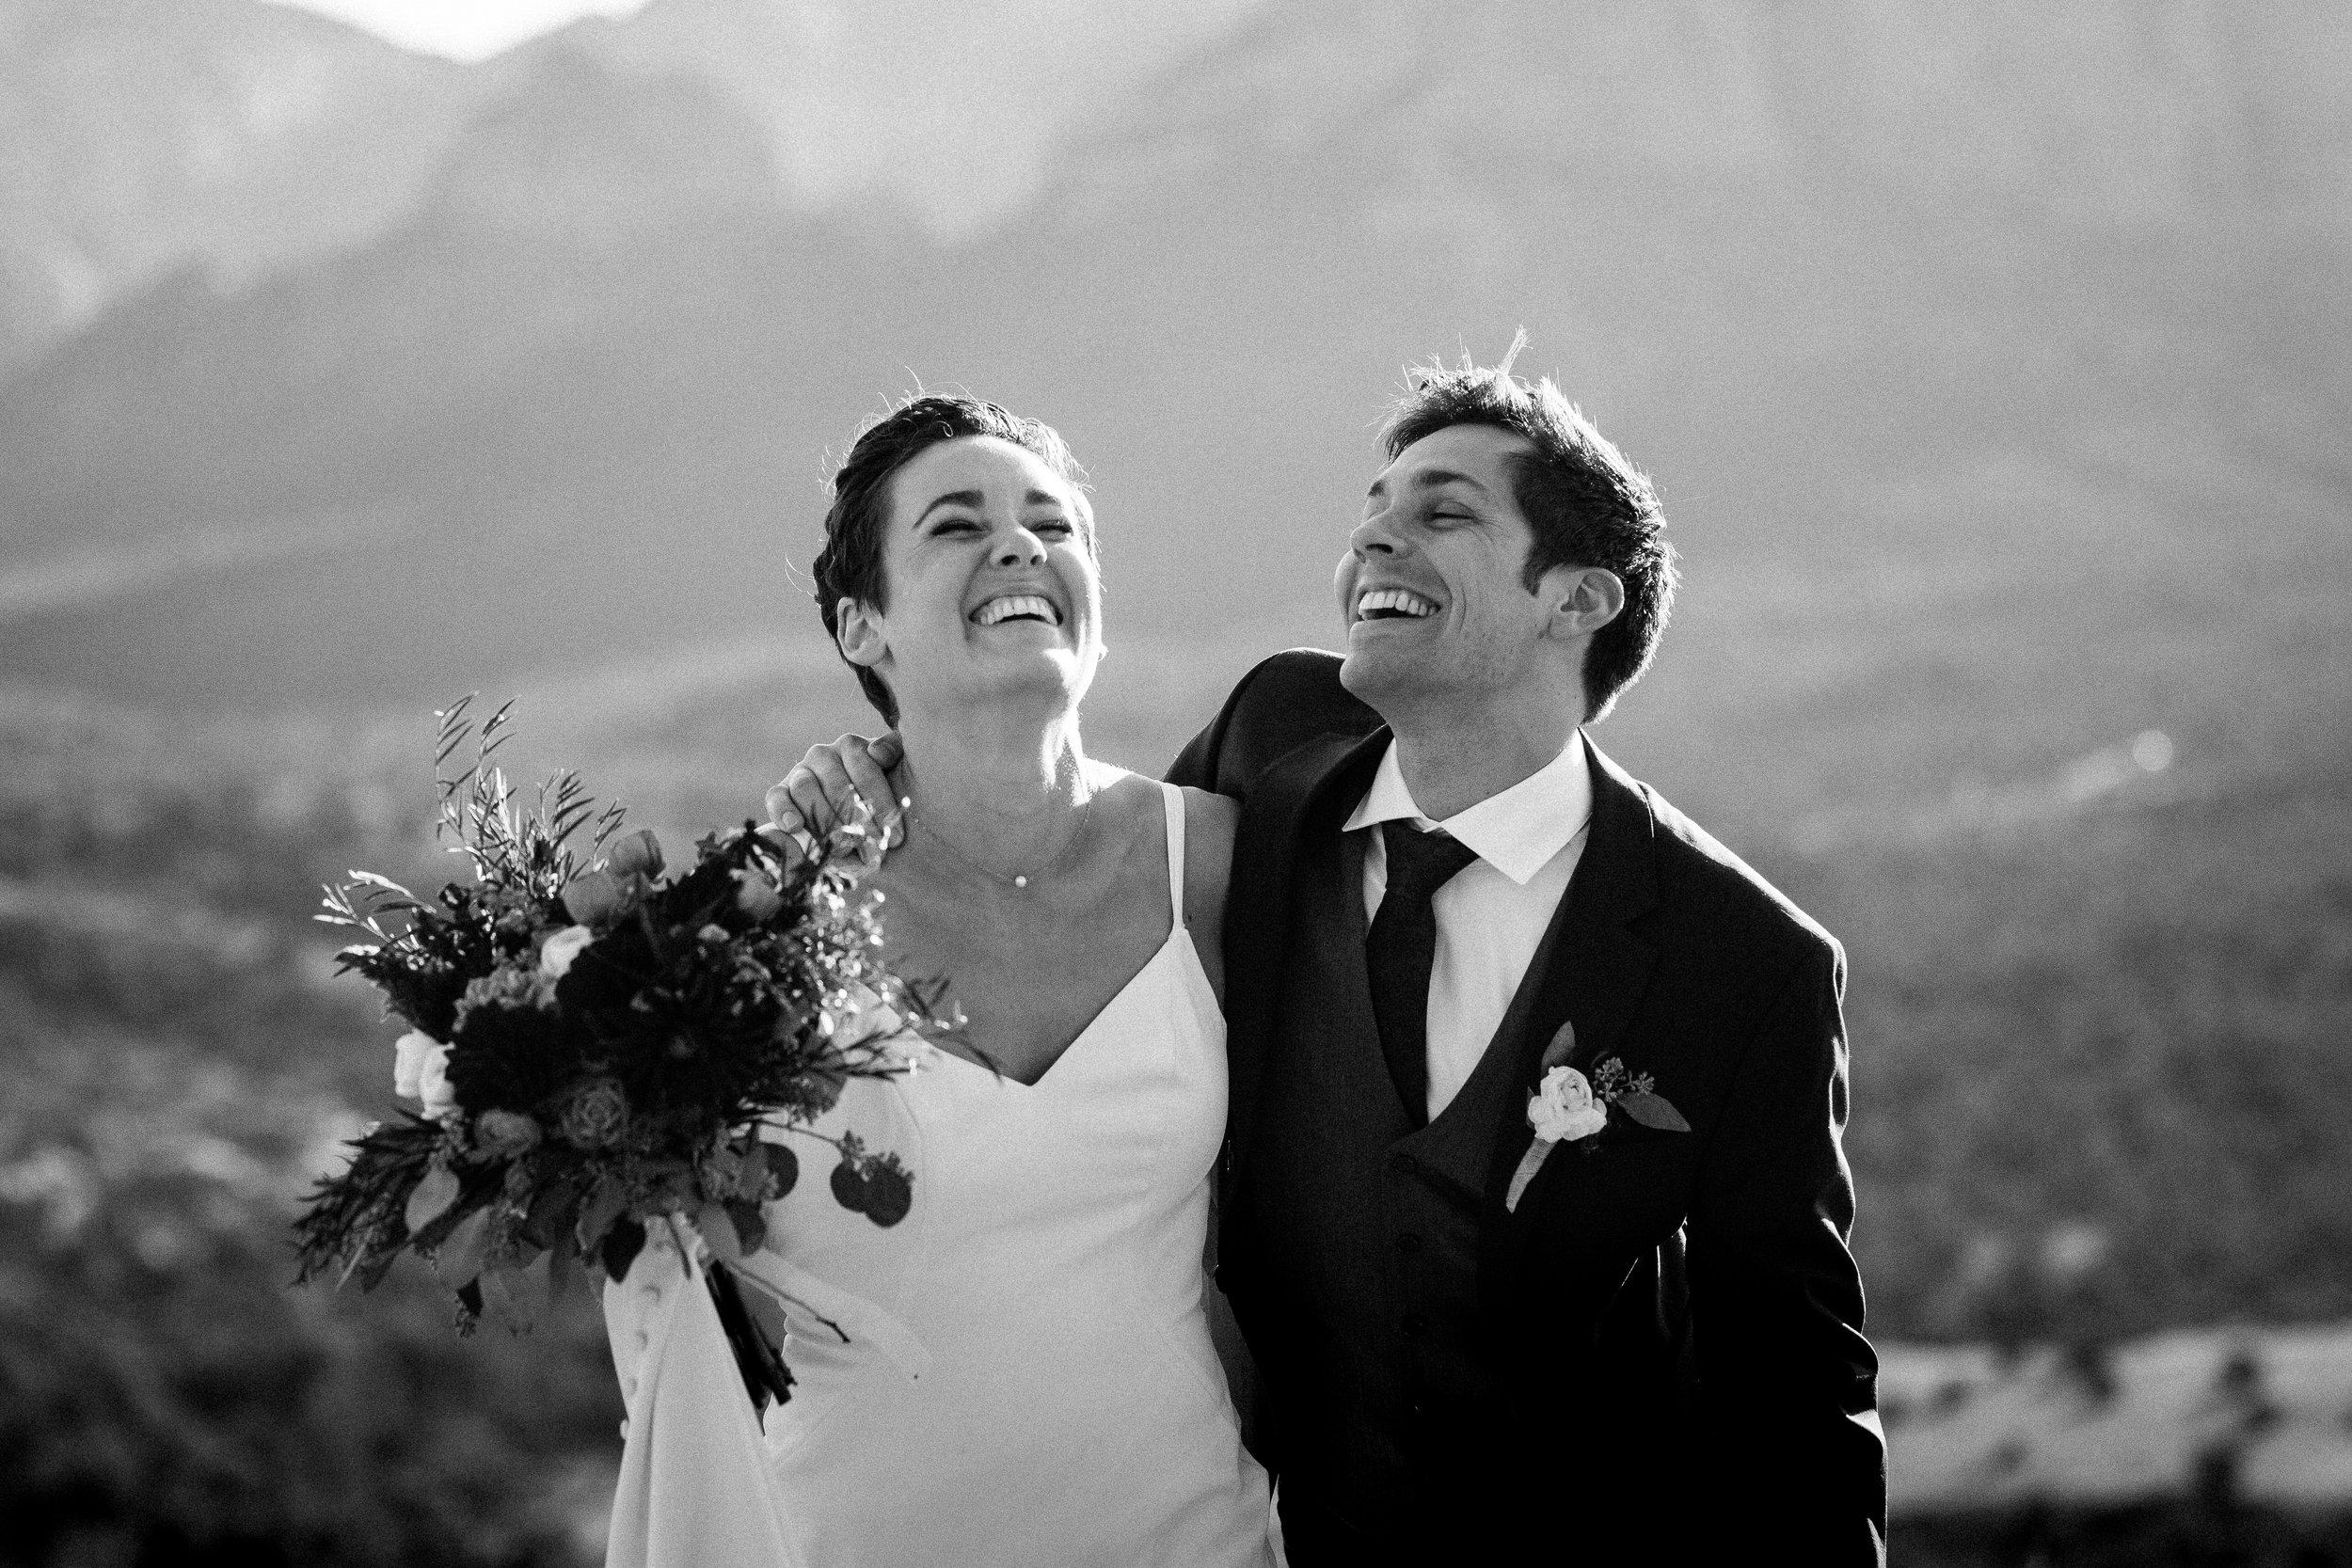 nicole-daacke-photography-sedona-arizona-destination-elopement-wedding-photographer-catherdral-rock-hiking-elopement-sedona-river-elopement-photos-desert-rock-wedding-photographer-laid-back-spontaneous-elopement-69.jpg